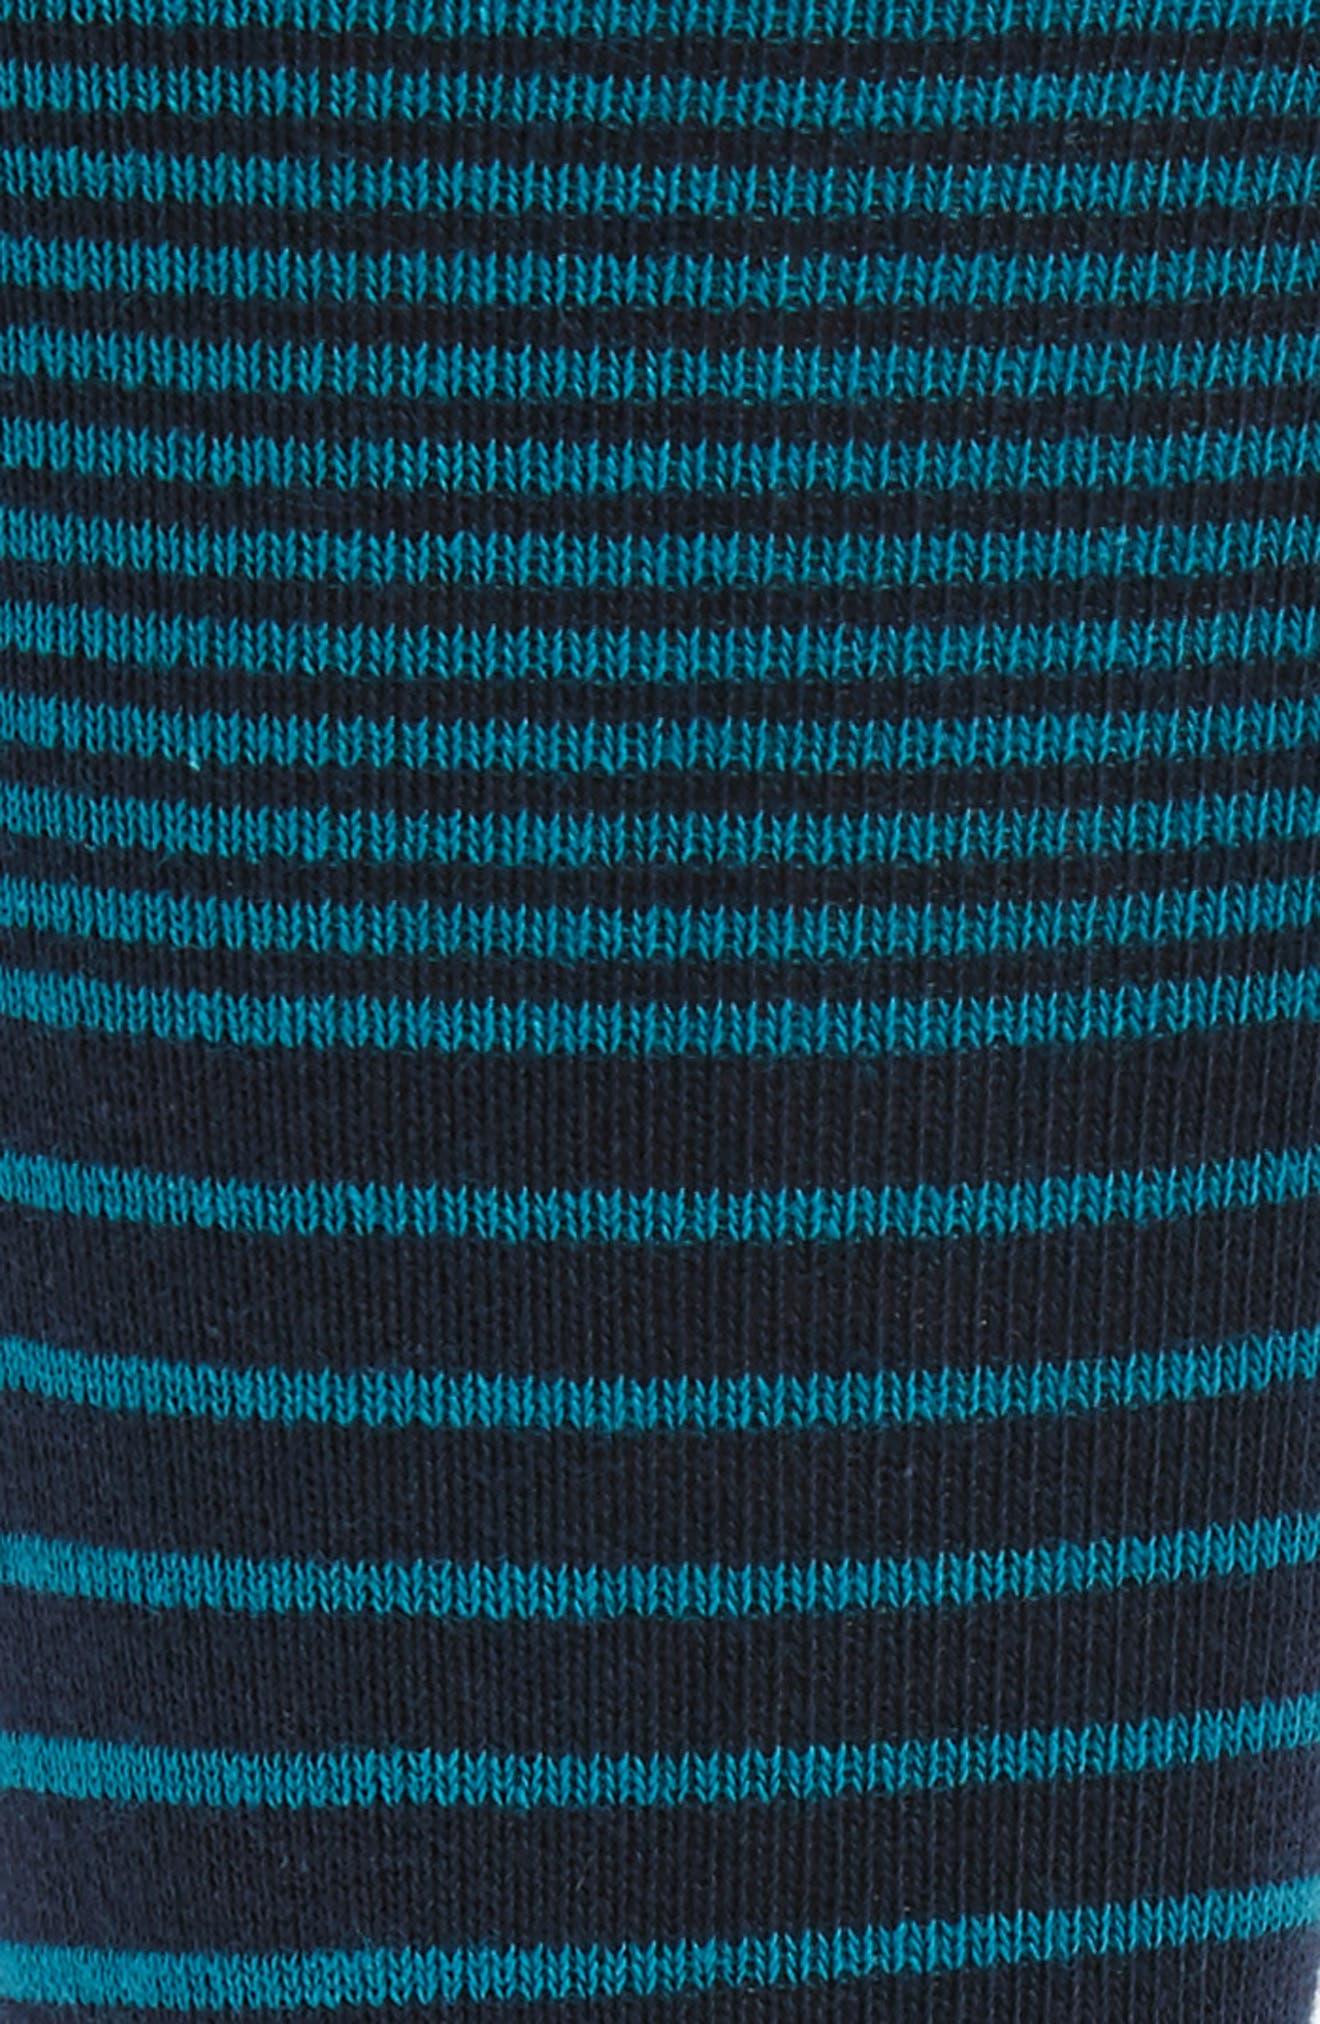 Multi Stripe Socks,                             Alternate thumbnail 2, color,                             Teal/ Navy